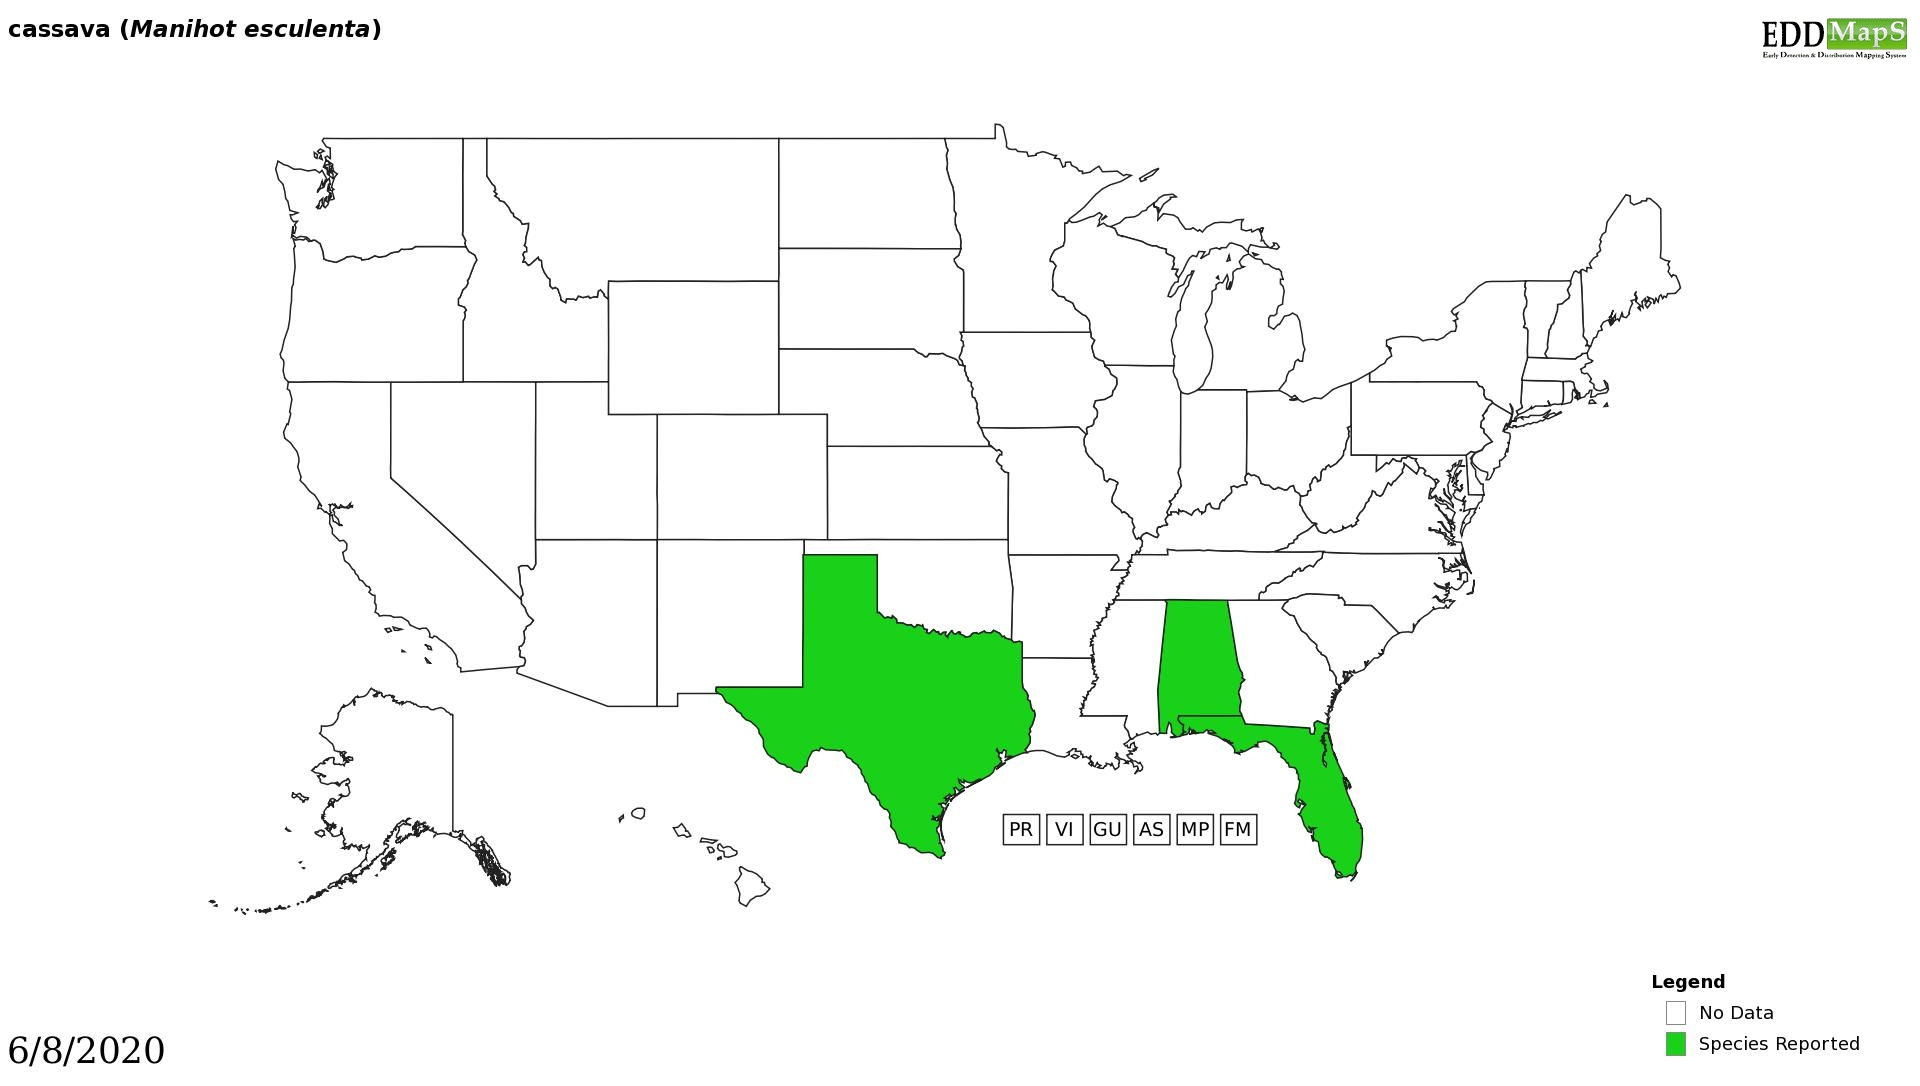 Cassava distribution - United States